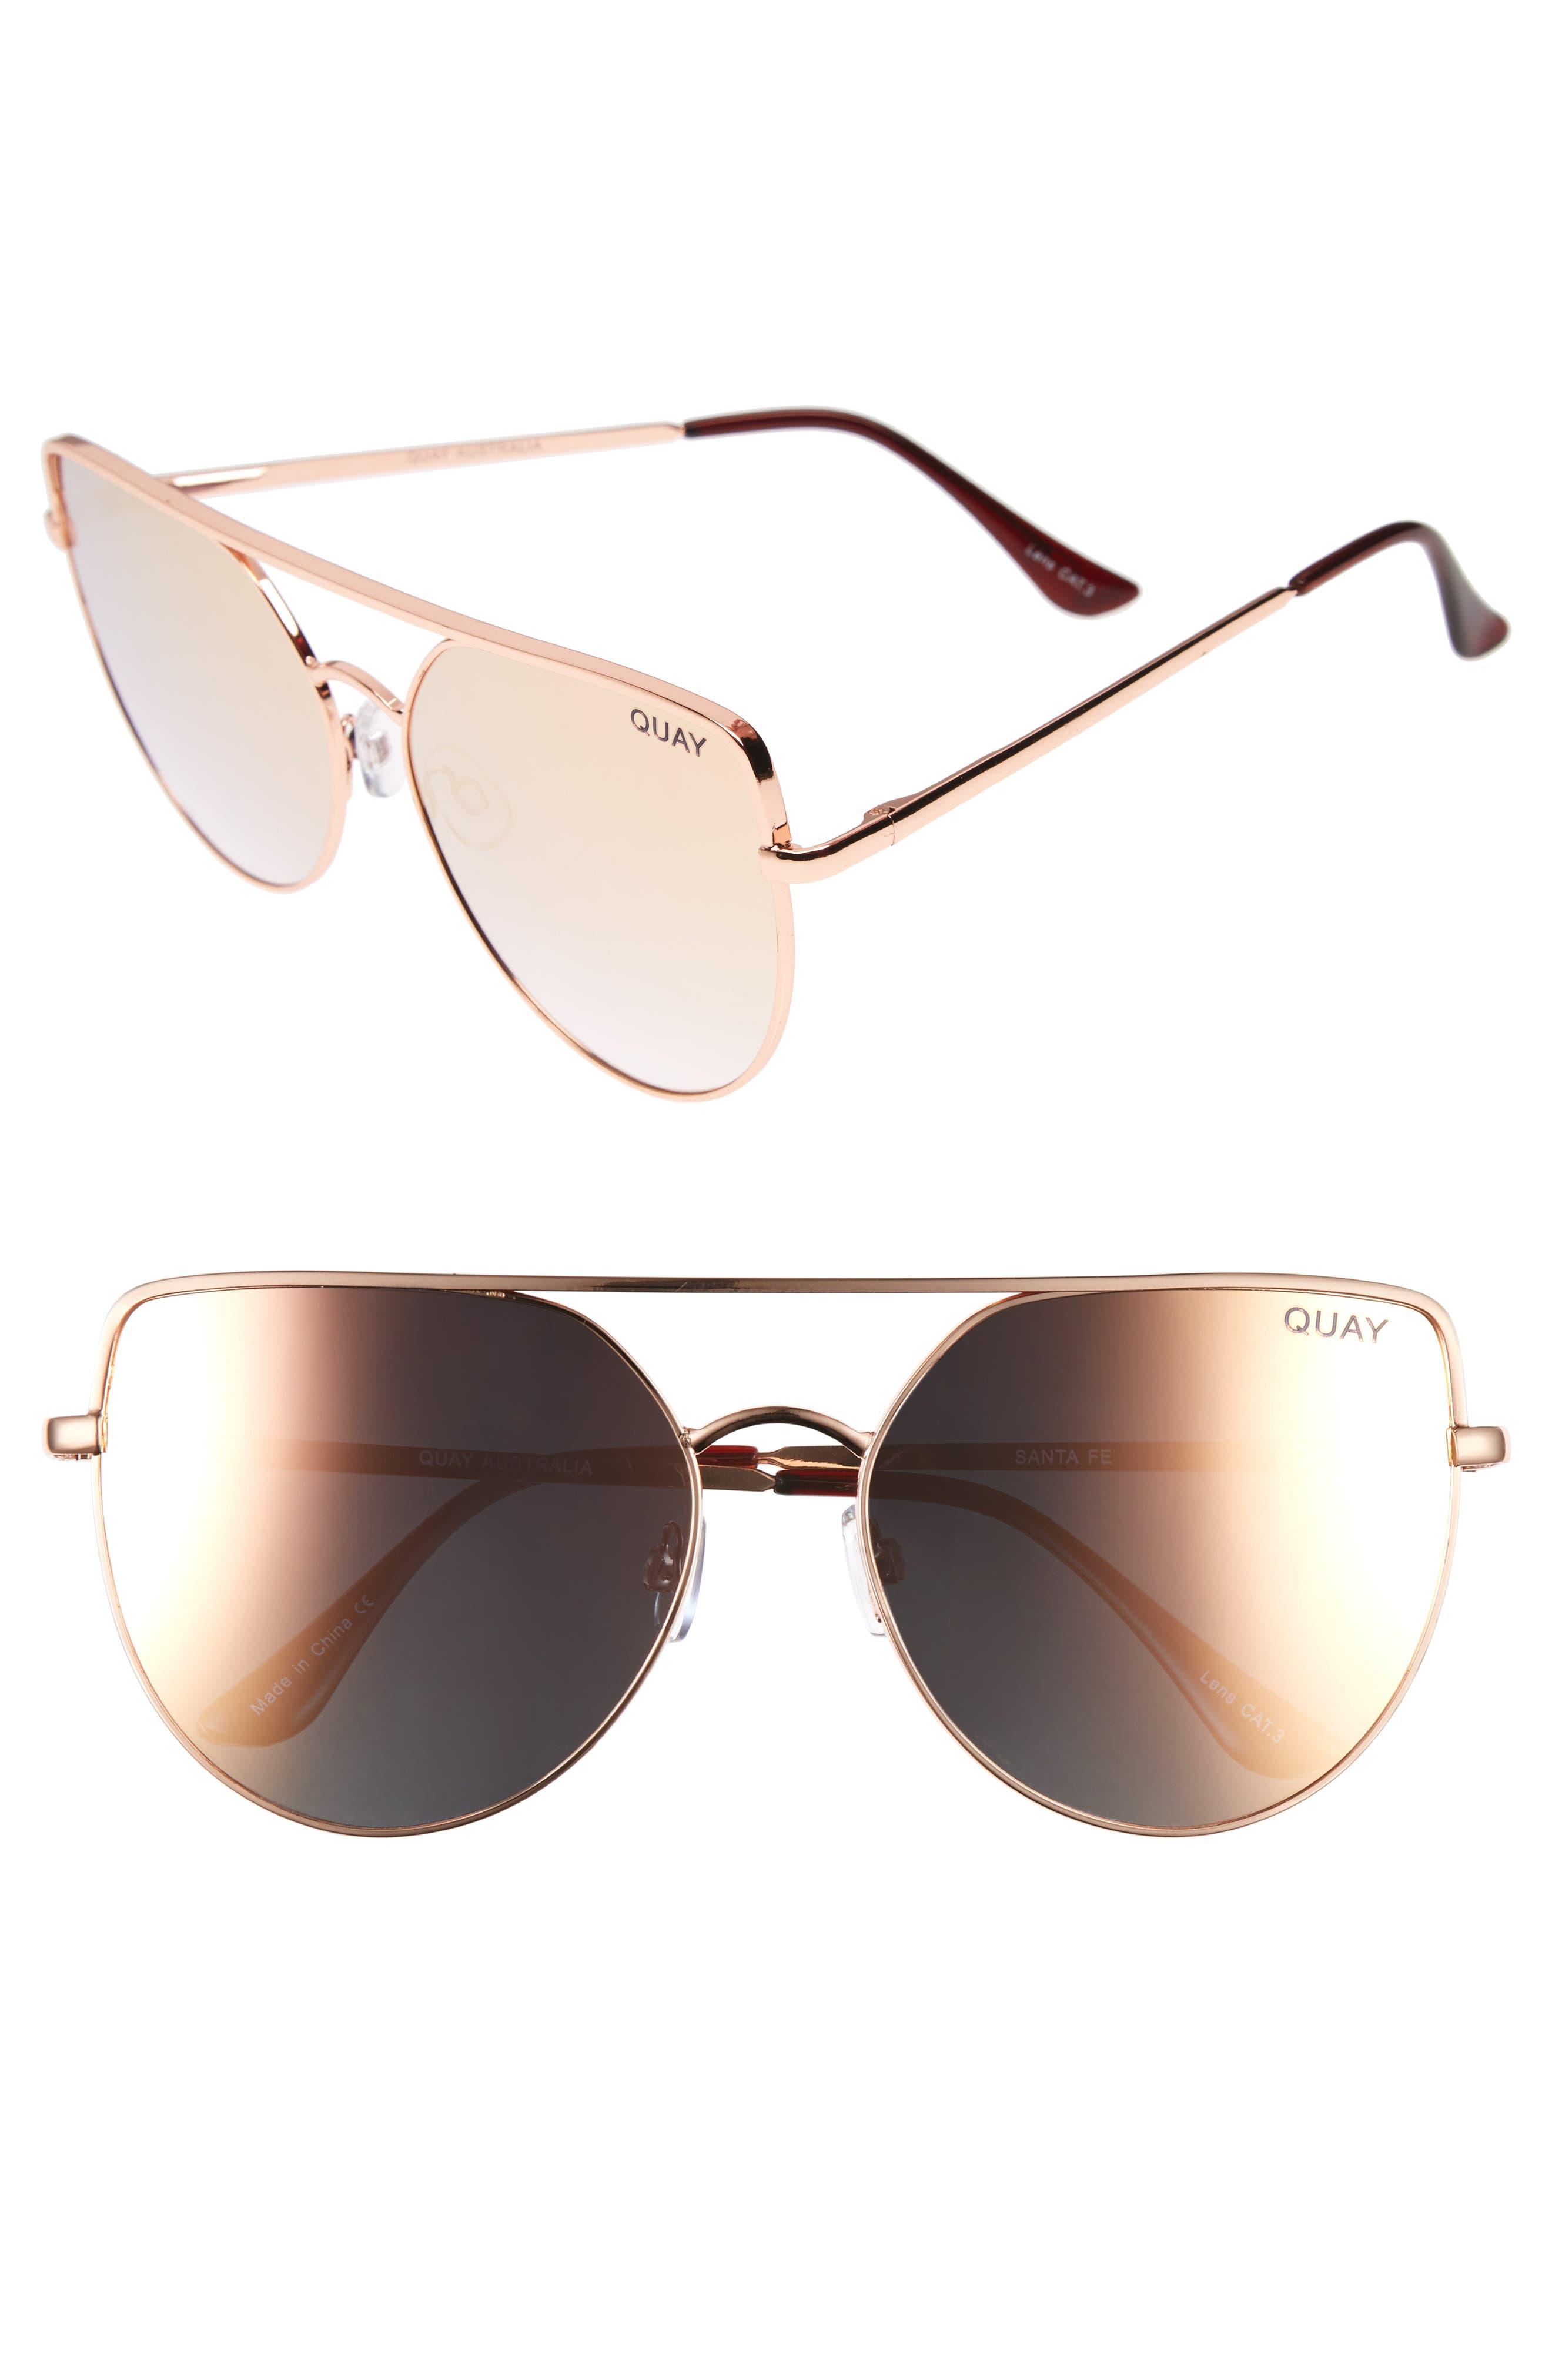 Main Image - Quay Australia x Jasmine Sanders Santa Fe 65mm Aviator Sunglasses